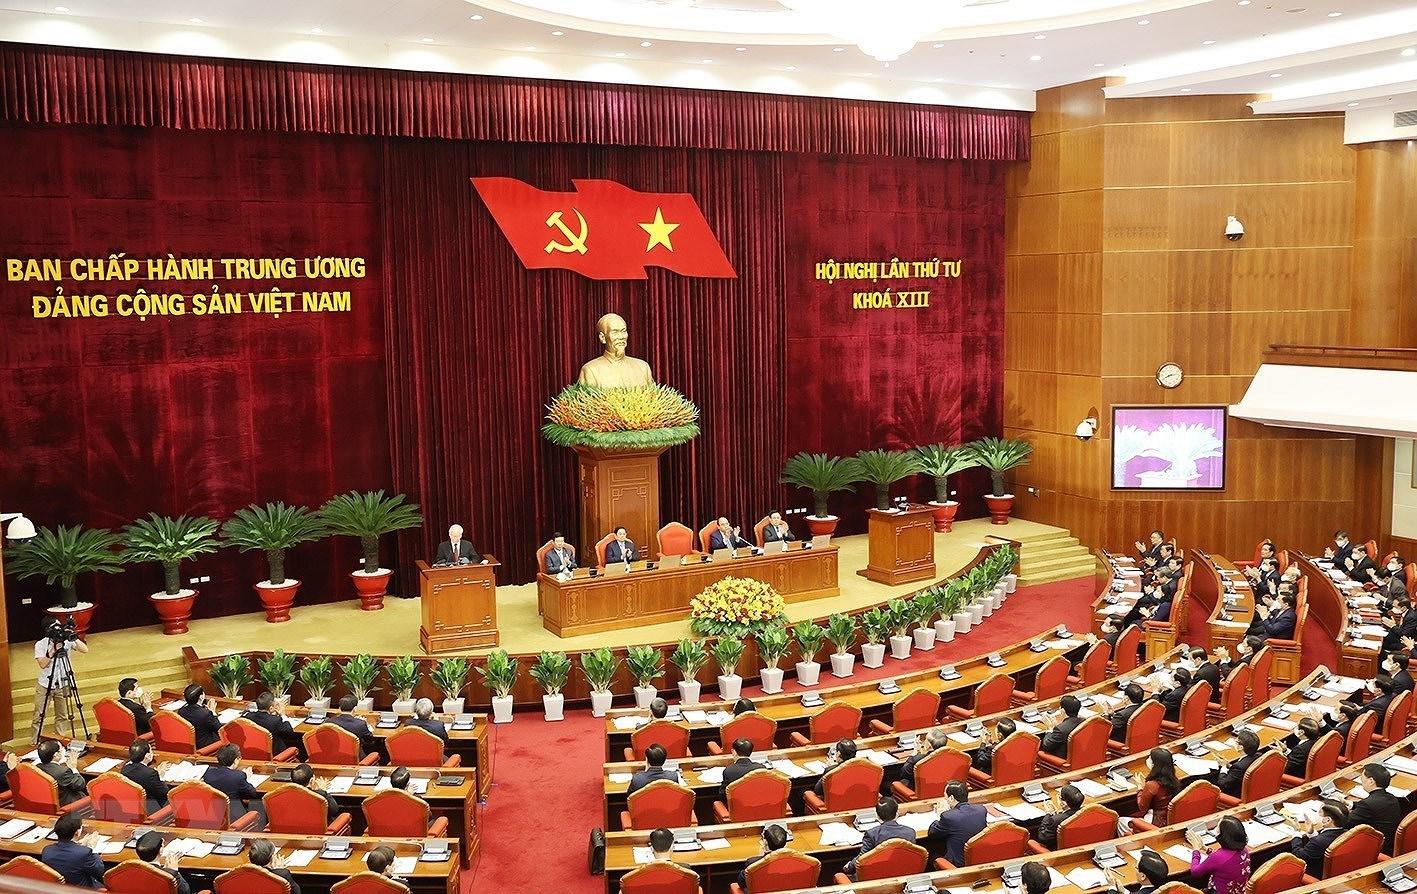 [Photo] Hoi nghi lan thu tu Ban Chap hanh Trung uong Dang khoa XIII hinh anh 2